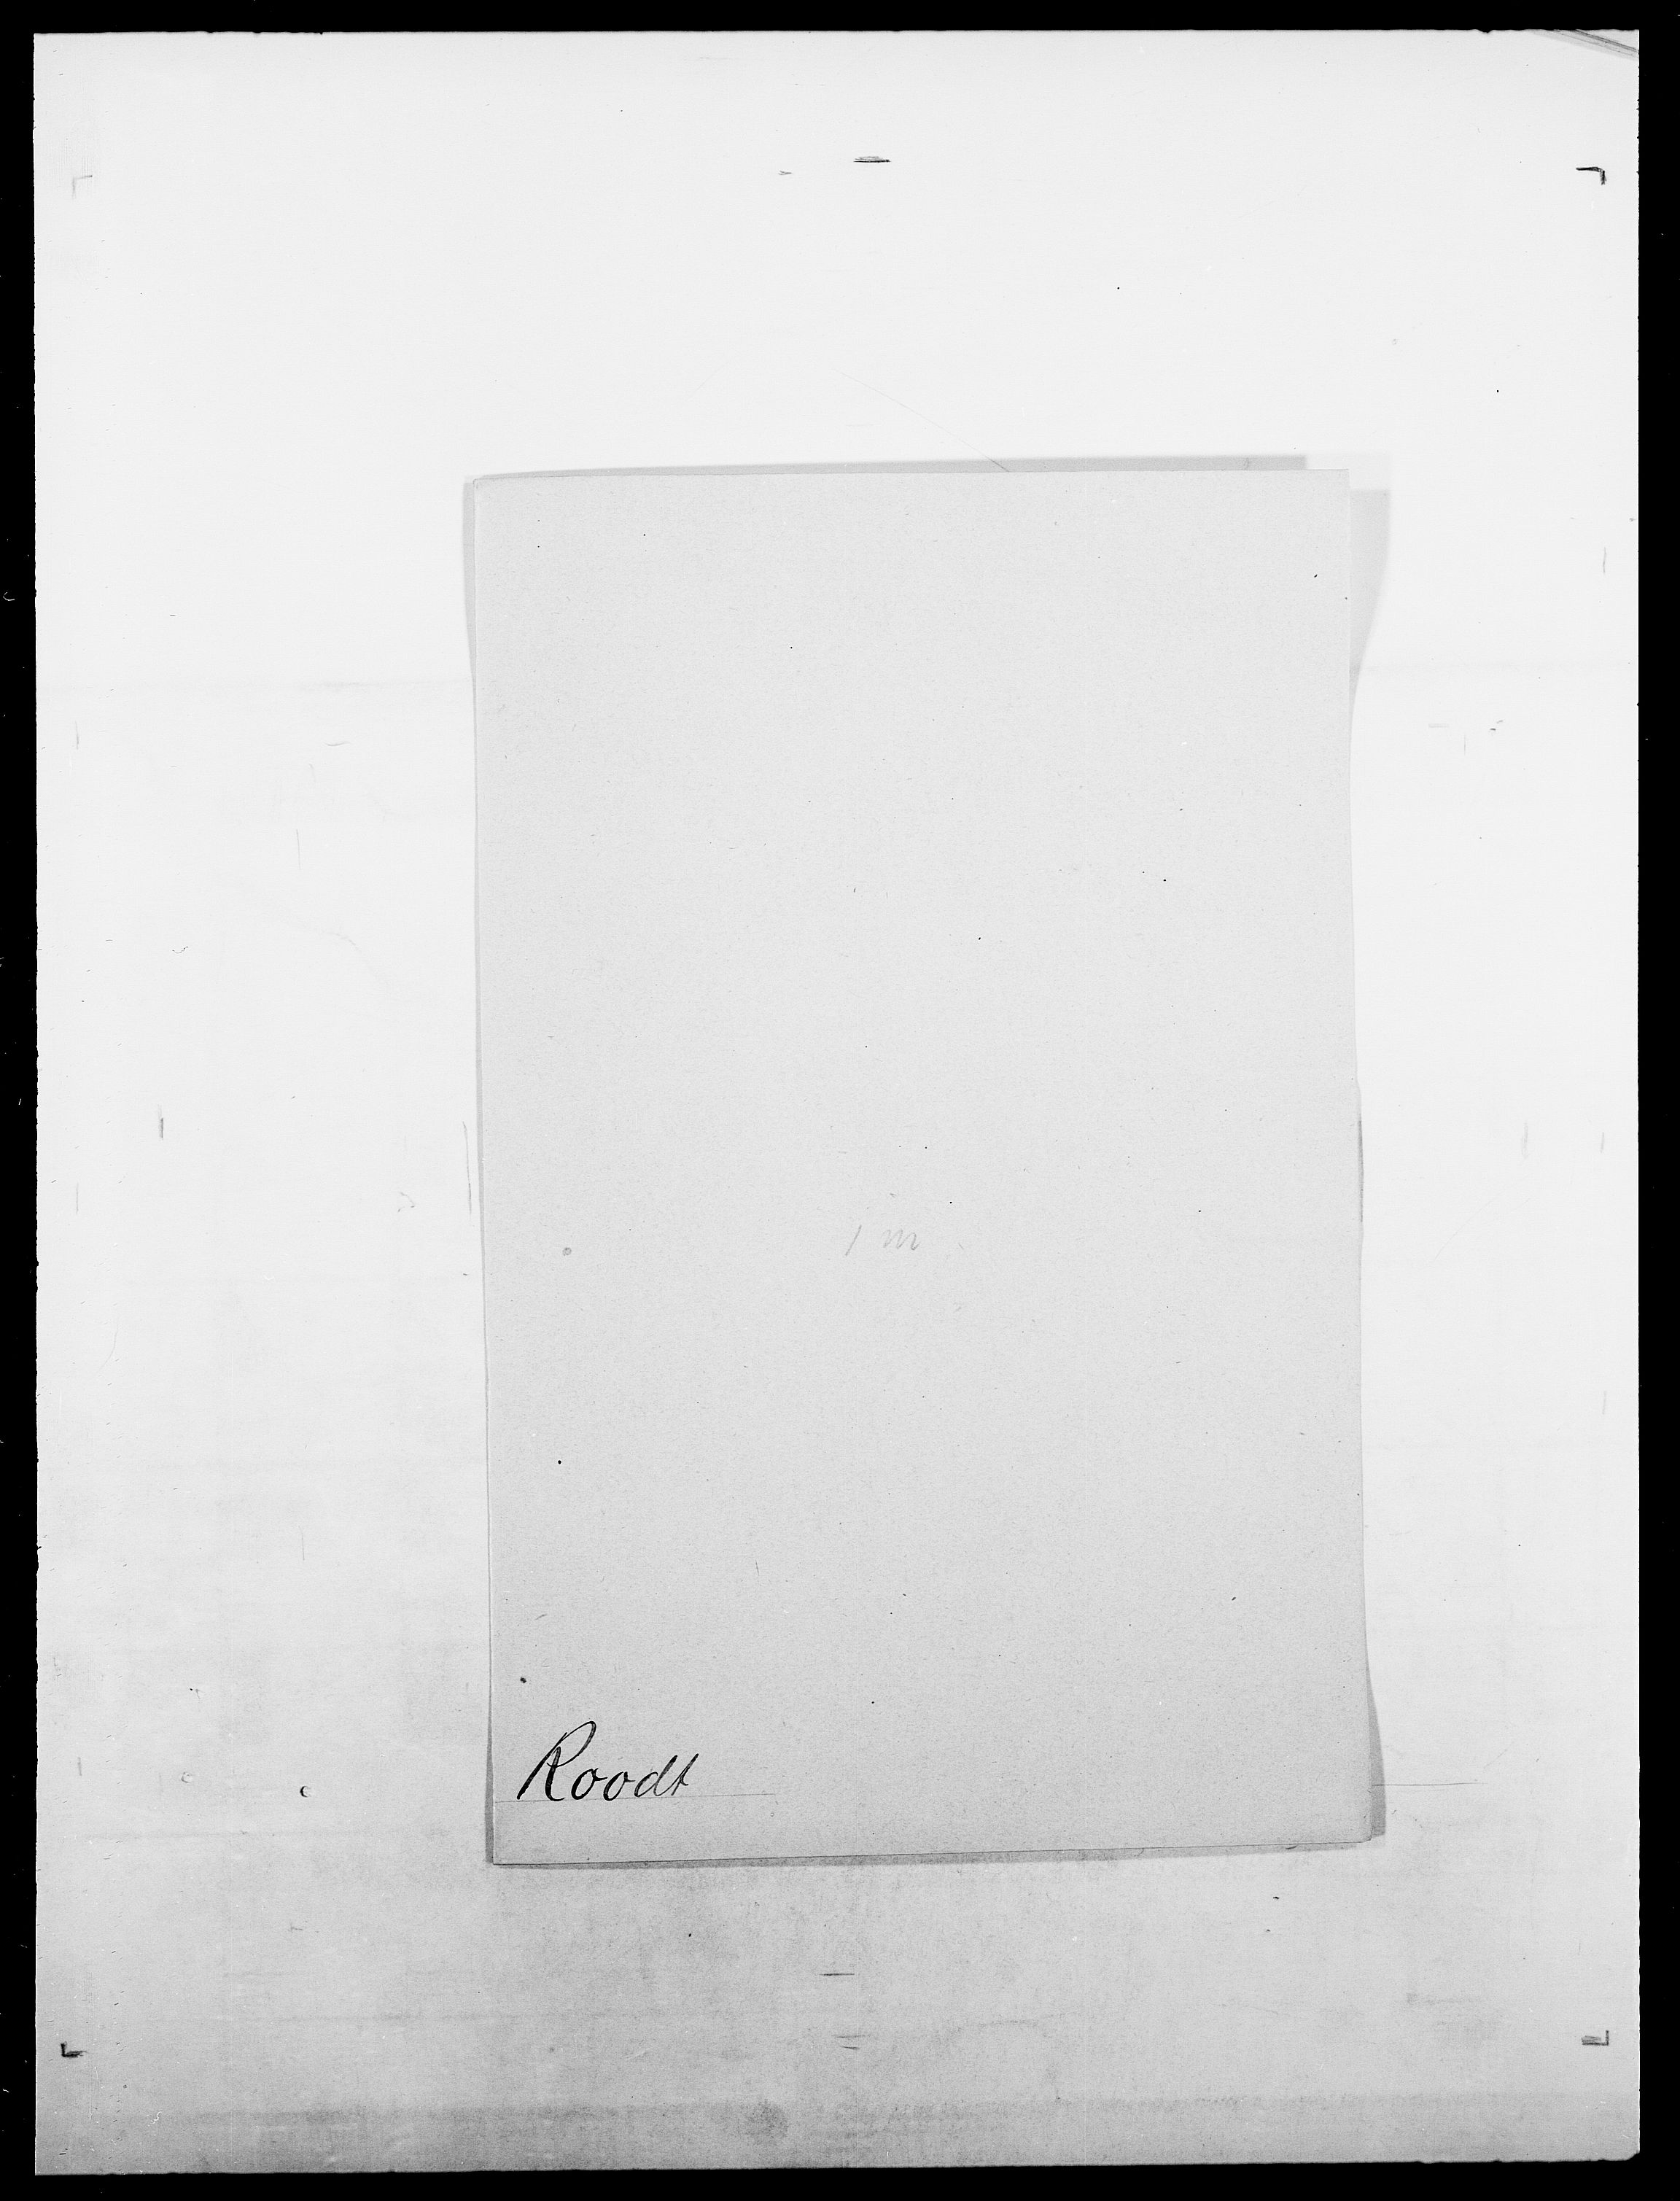 SAO, Delgobe, Charles Antoine - samling, D/Da/L0033: Roald - Røyem, s. 173